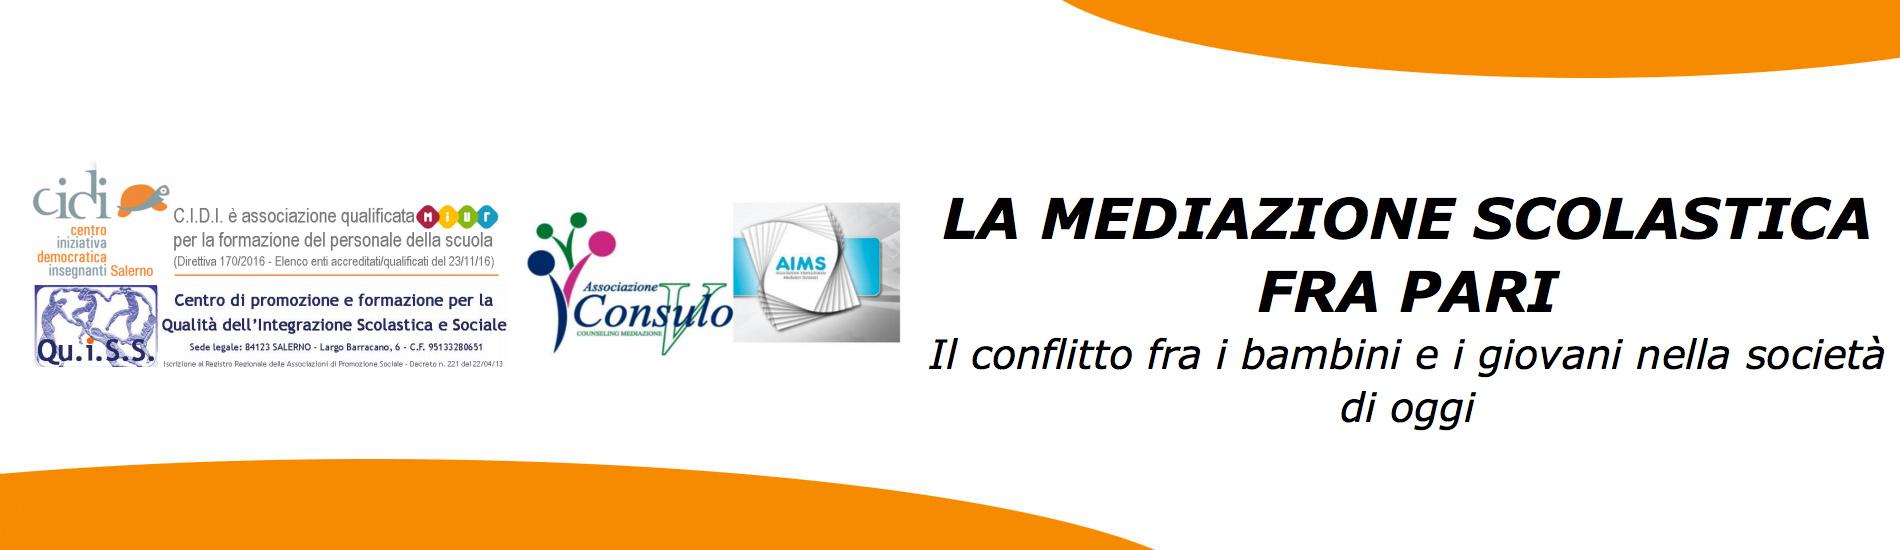 slide mediazione pari